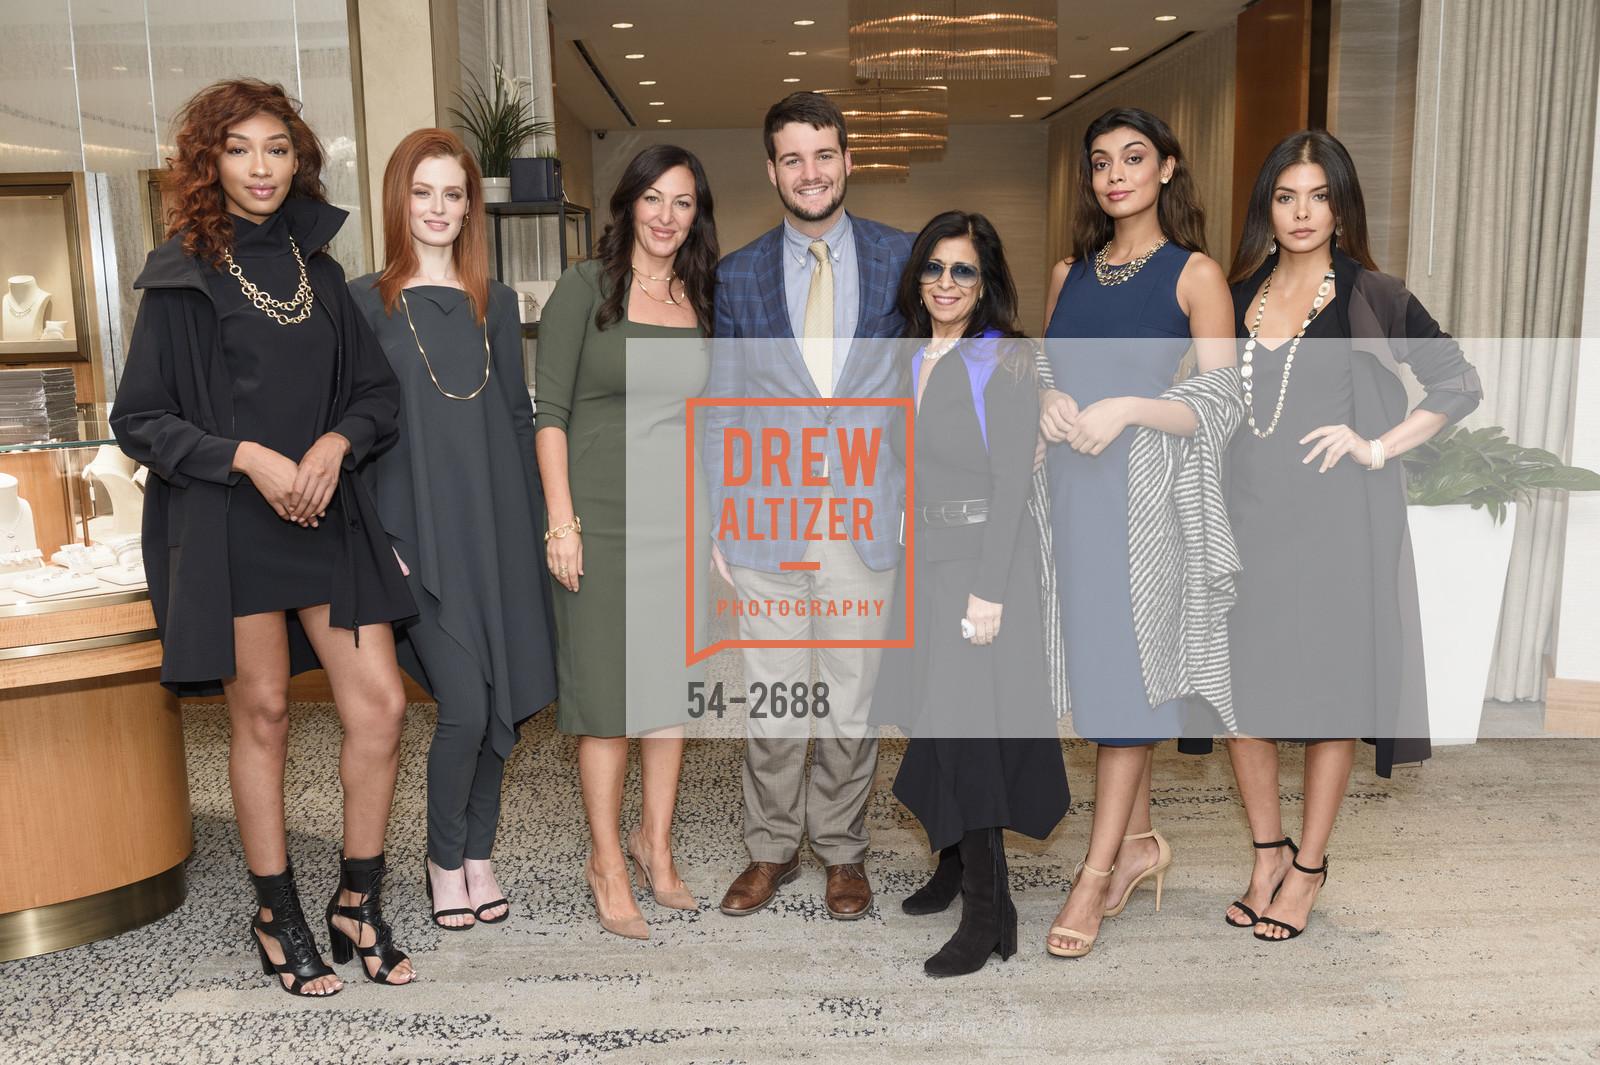 Imani Walton, Moana Holden, Ren Schiffman, Maria Pinto, Ghazal Gill, Leah Morris, Photo #54-2688